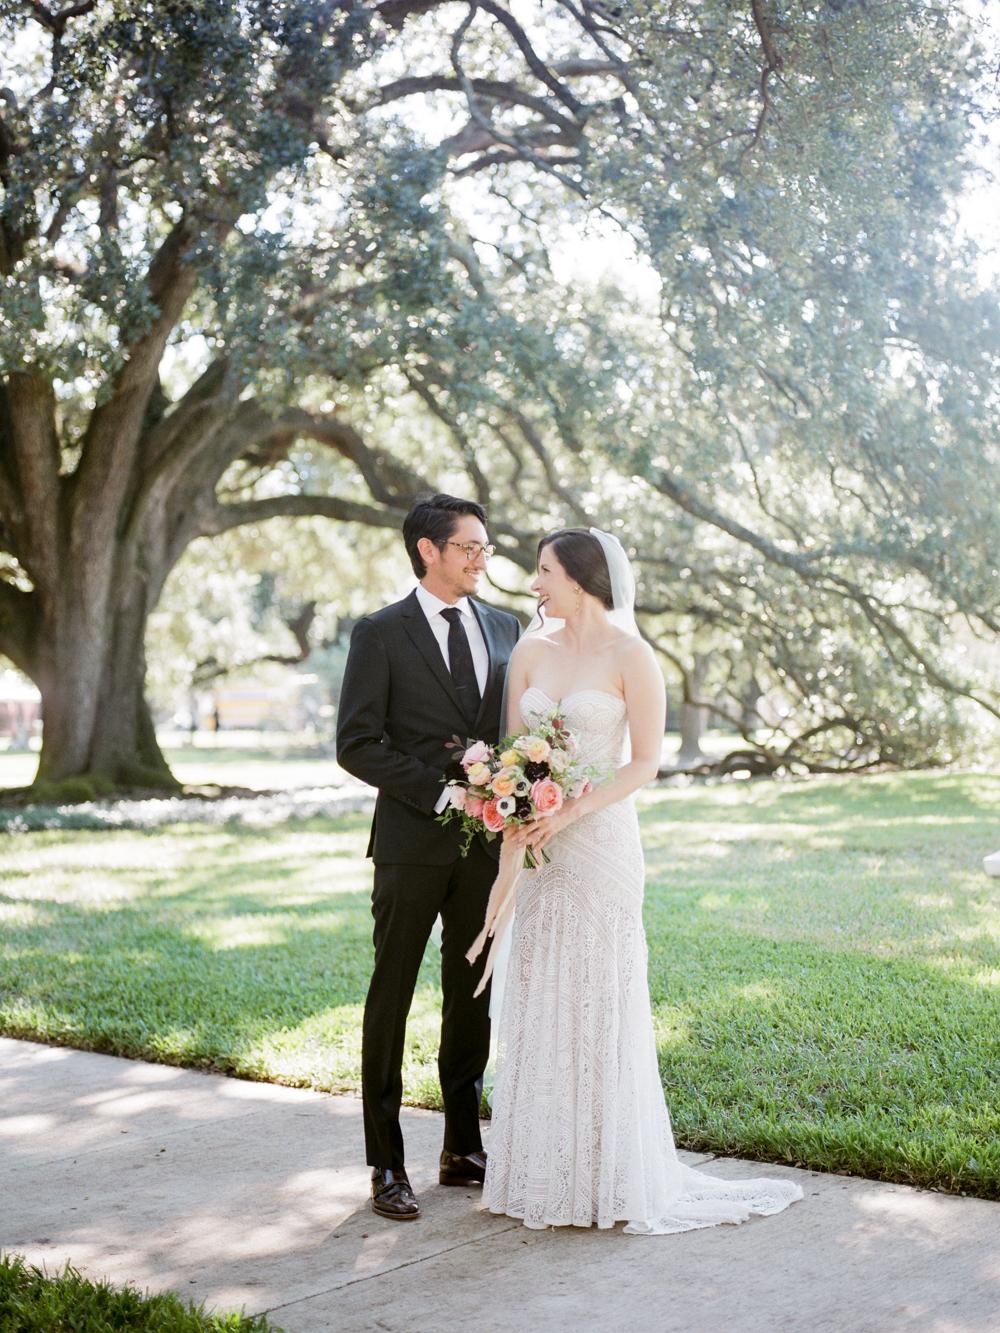 fall wedding at rothko chapel- houston wedding photographer-christine gosch - film photographer - elopement photographer- intimate wedding - lovely bride wedding gown-13.jpg